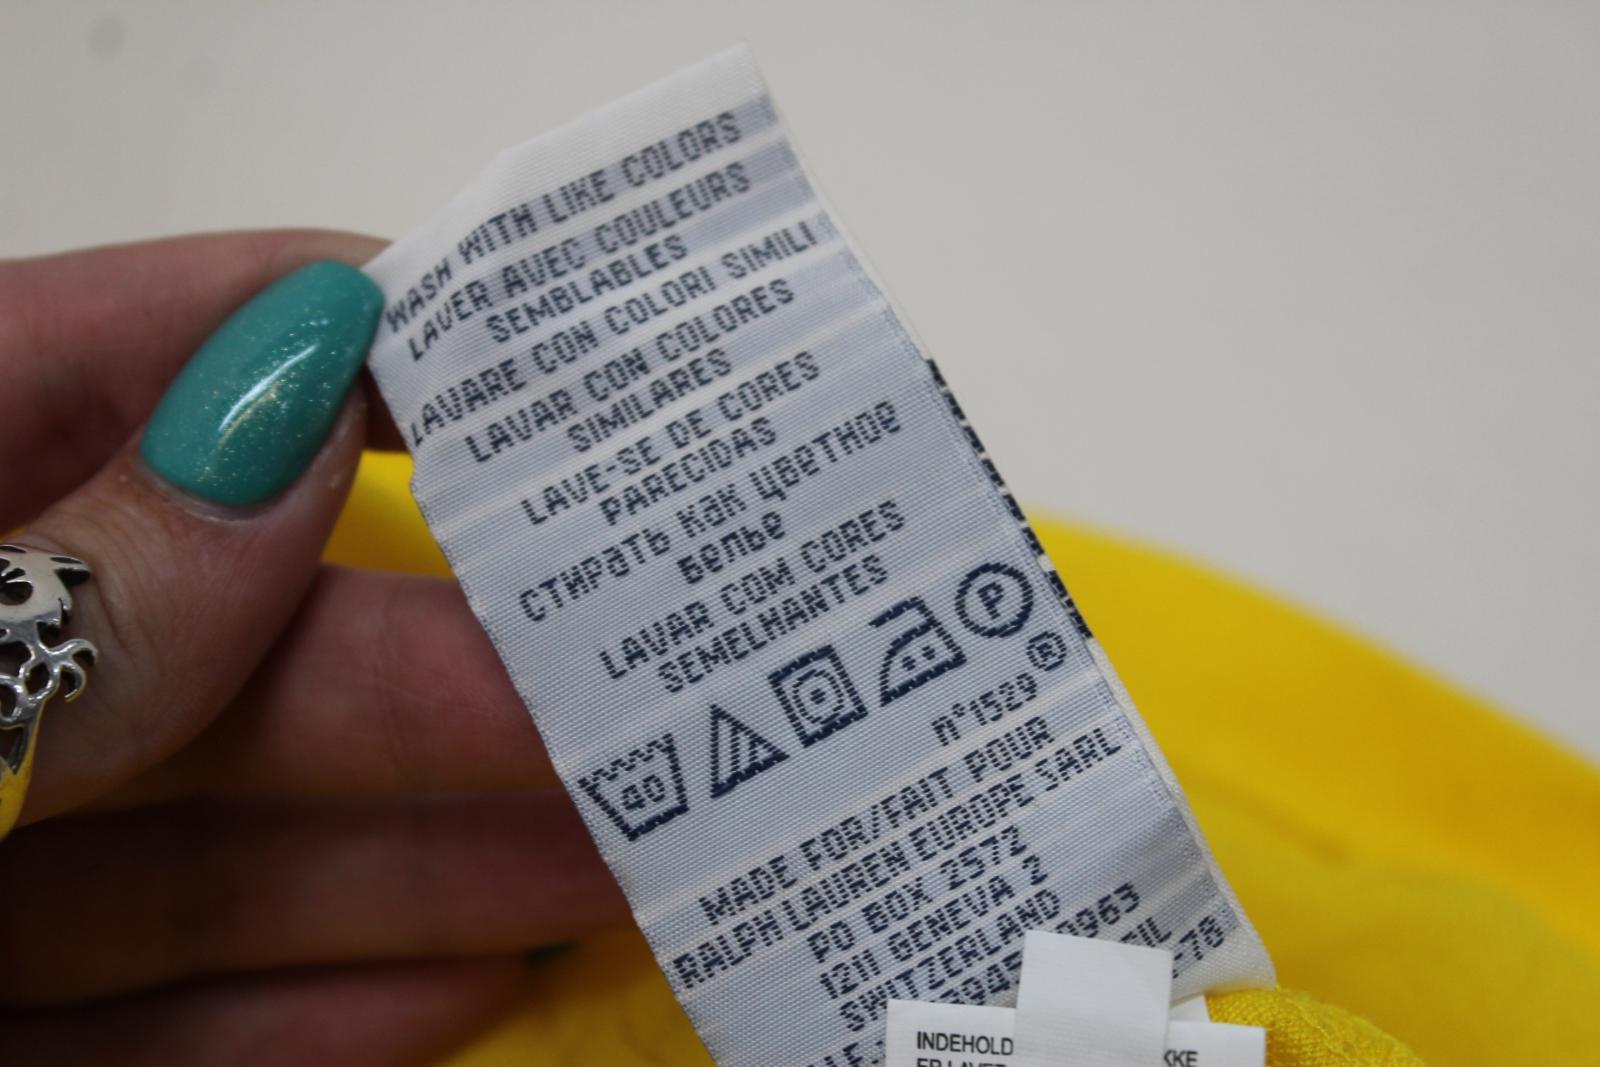 Ralph-Lauren-Polo-para-hombre-de-Amarillo-De-Algodon-Manga-Corta-Camisa-Polo-De-Ajuste-Personalizado miniatura 9